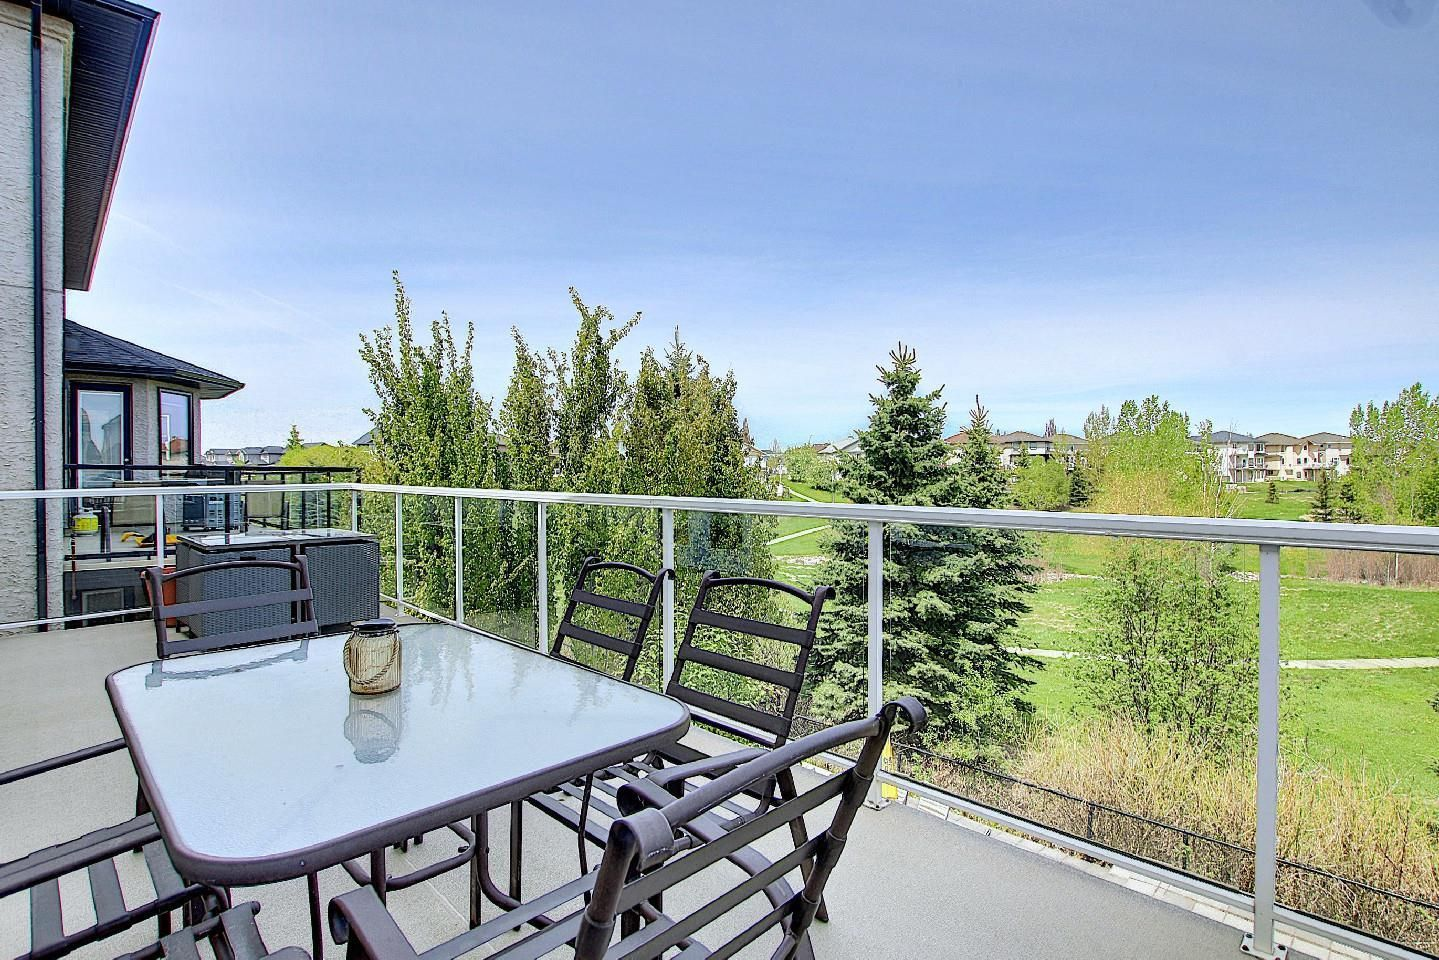 Main Photo: 13428 140 Avenue in Edmonton: Zone 27 House for sale : MLS®# E4245945